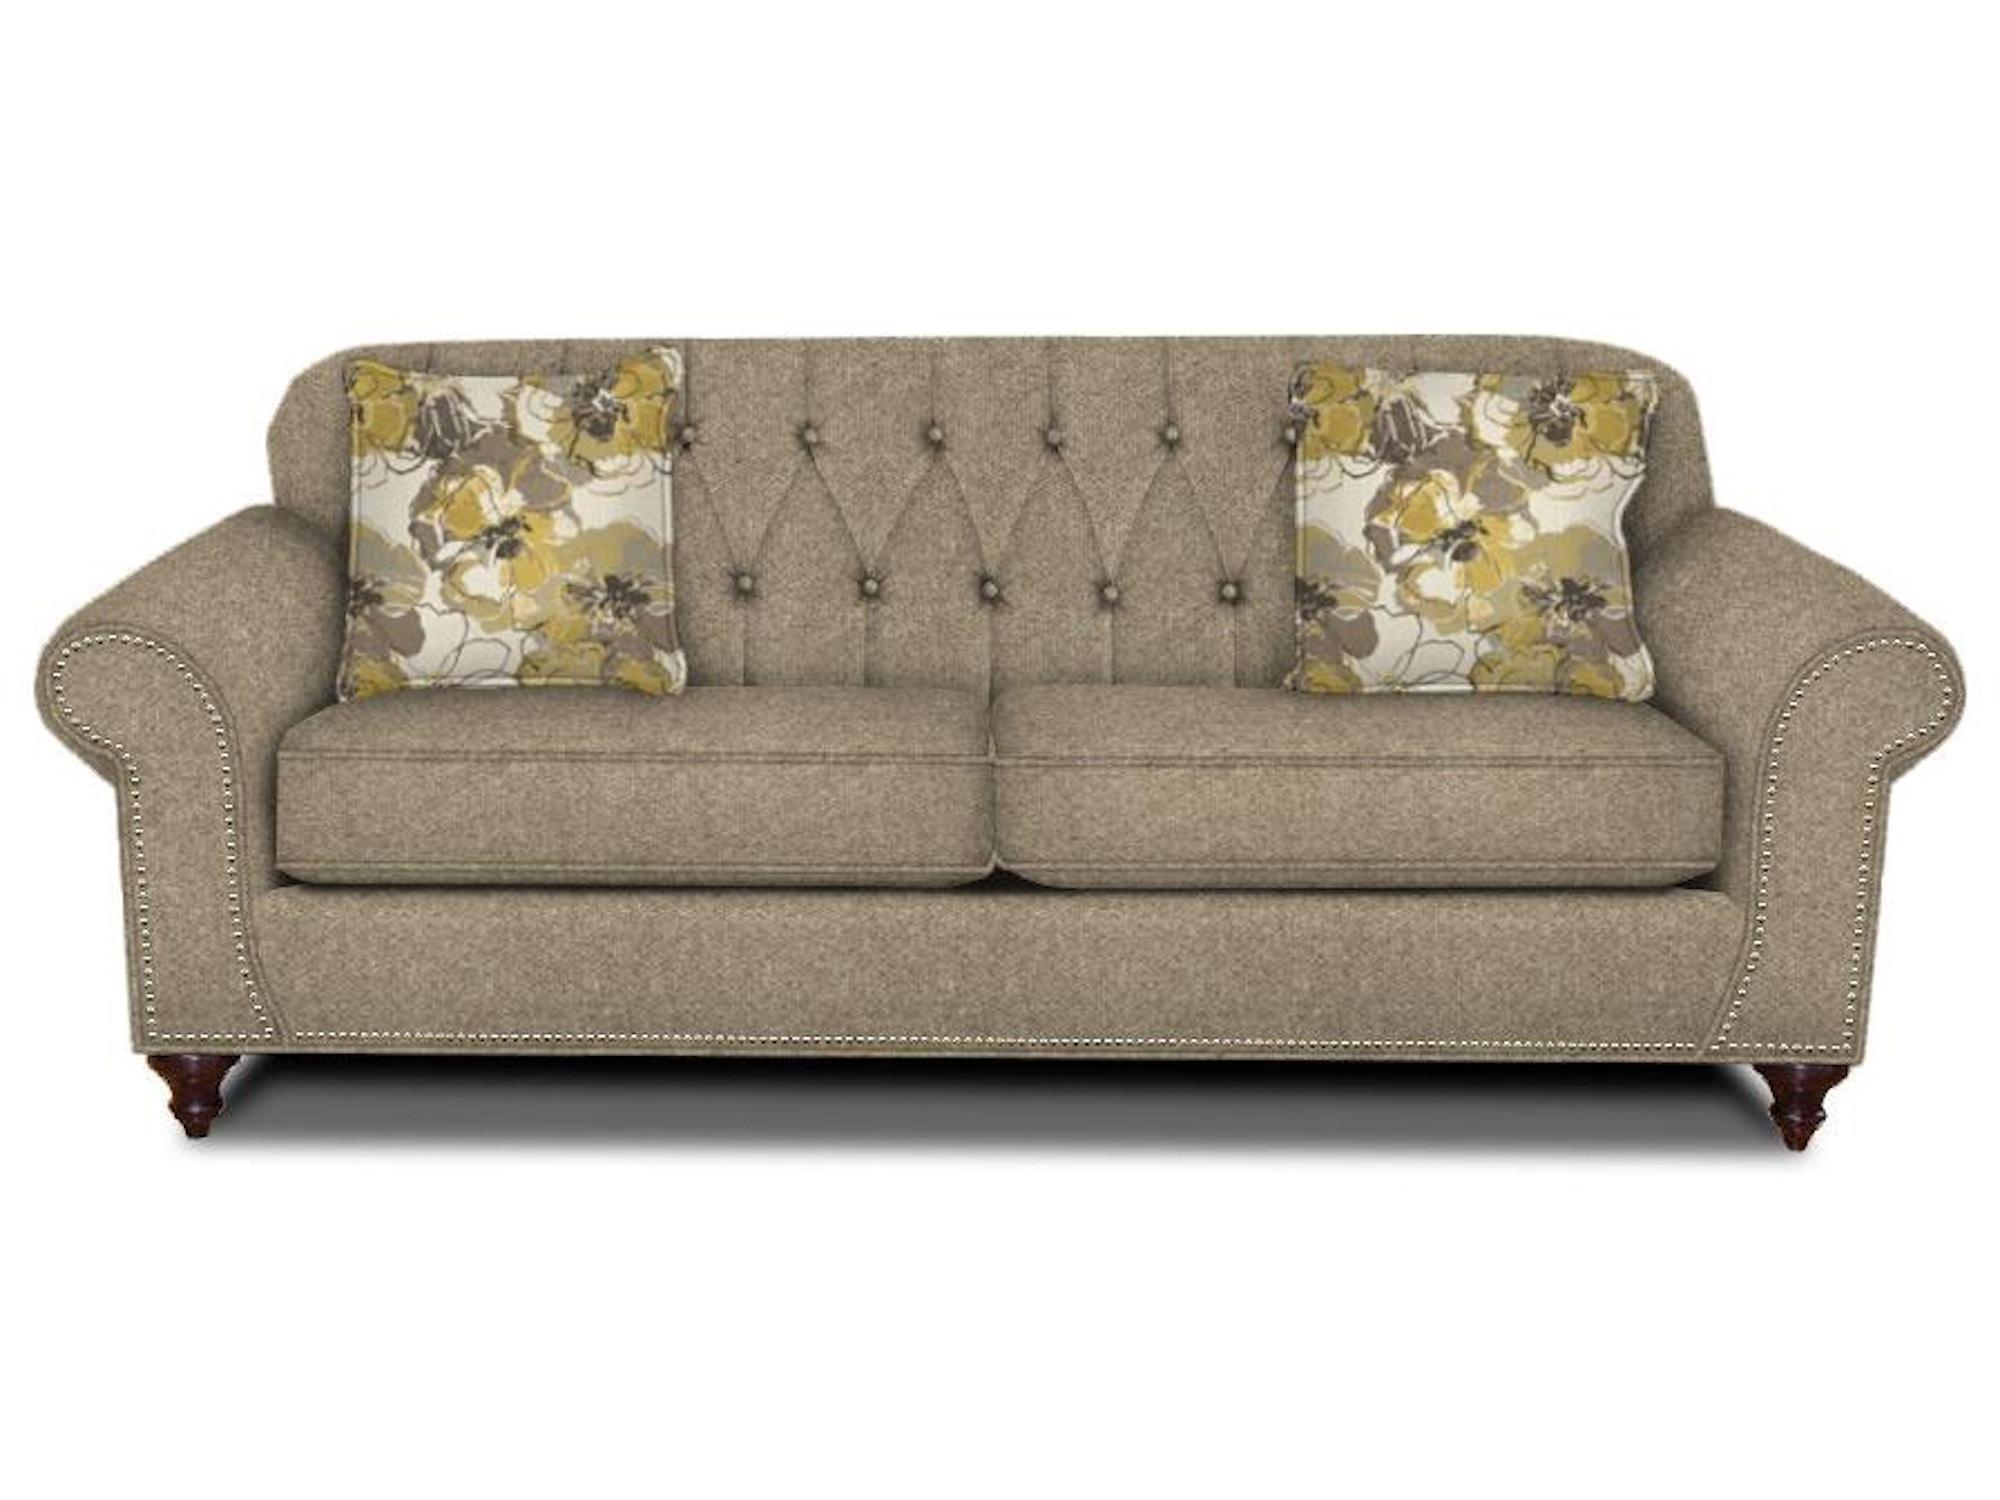 Living Room England Sofas Furniture Fair Cincinnati Dayton Oh And Northern Ky